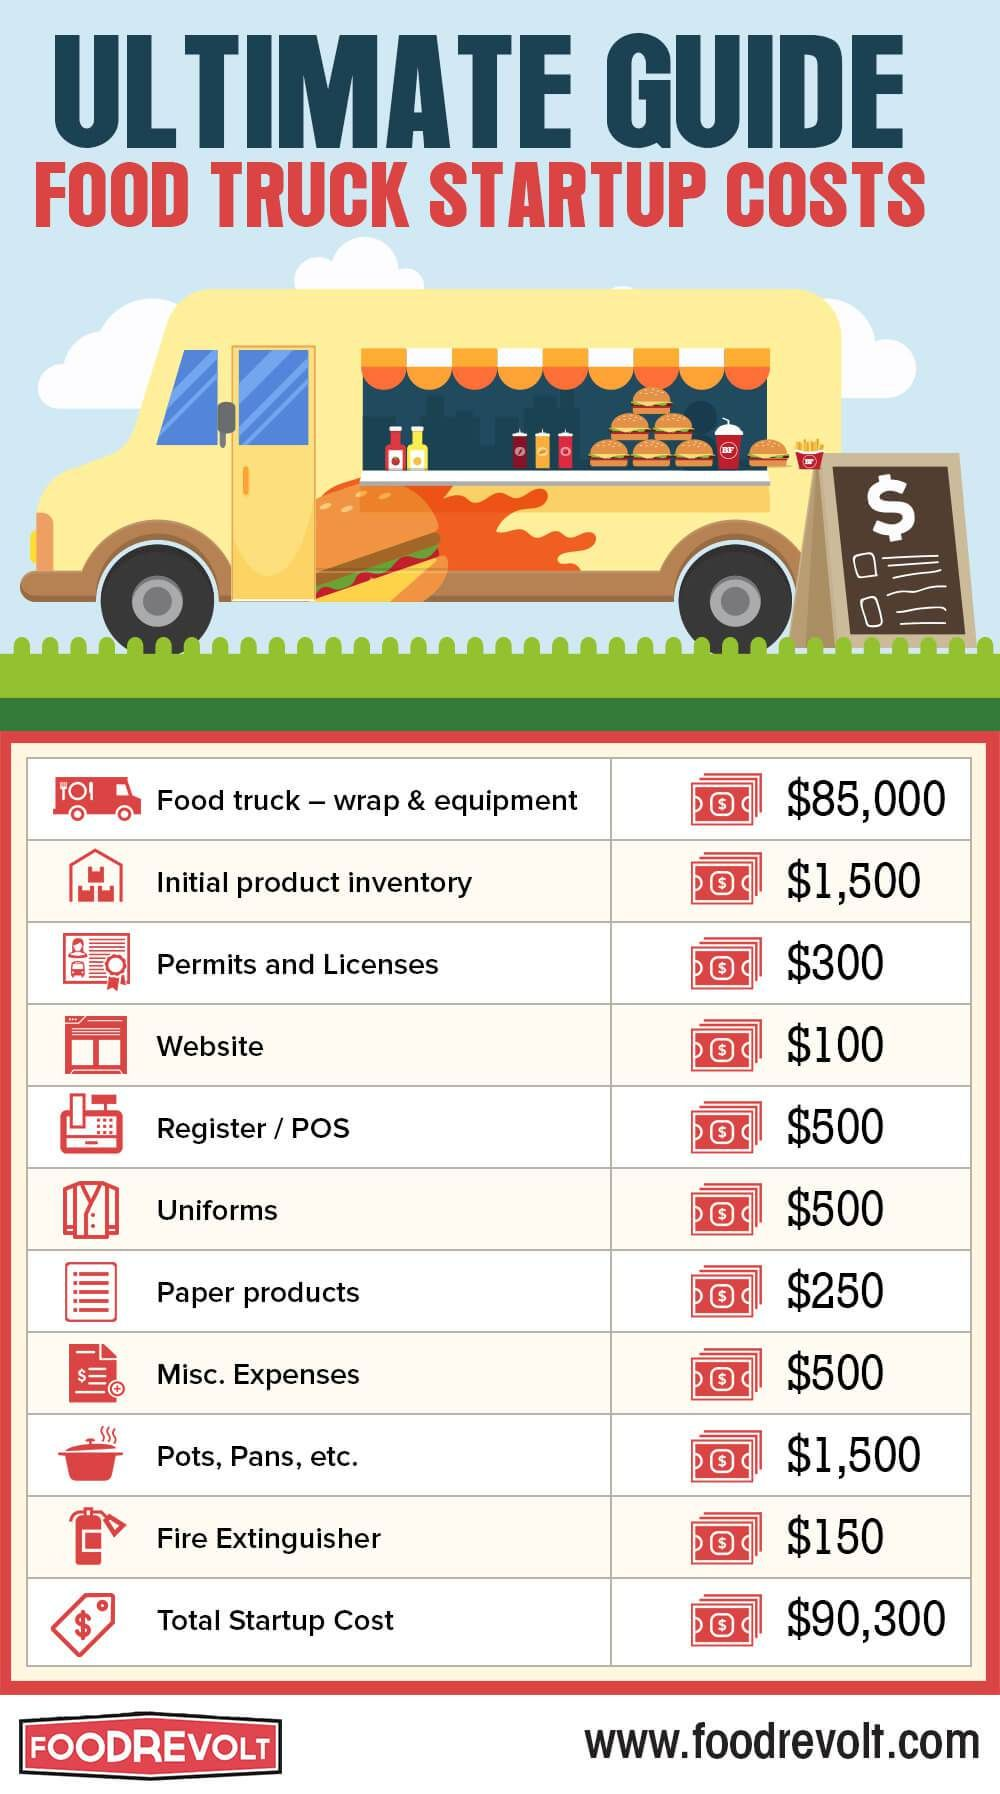 How Much Do Food Trucks Make Vegan Food Truck Food Truck Business Food Truck Business Plan